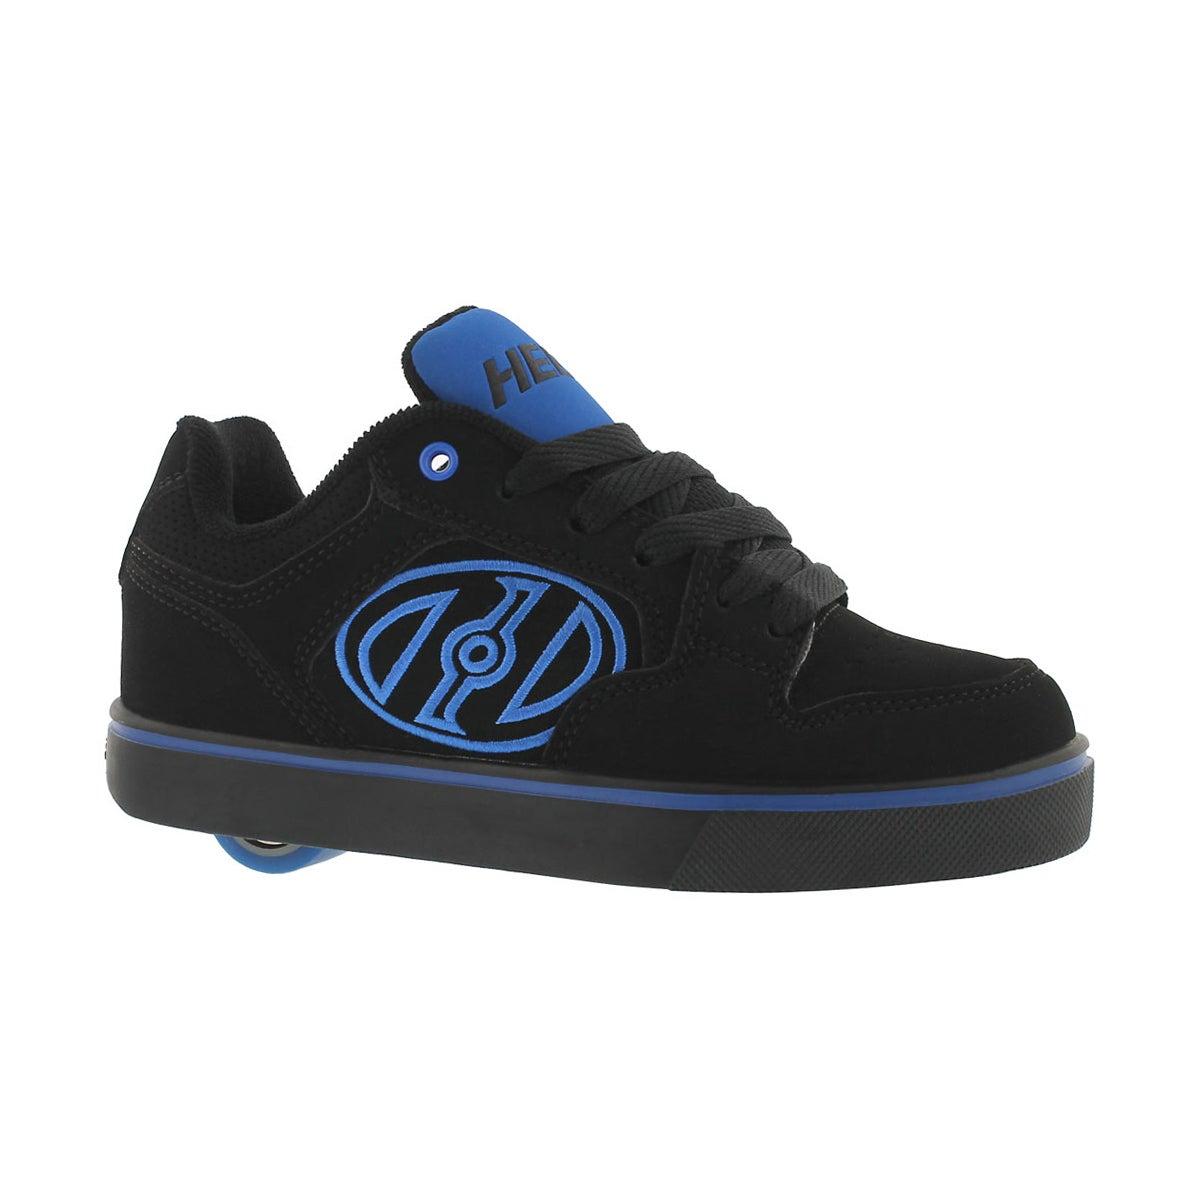 Boys' MOTION PLUS black/blue skate sneakers